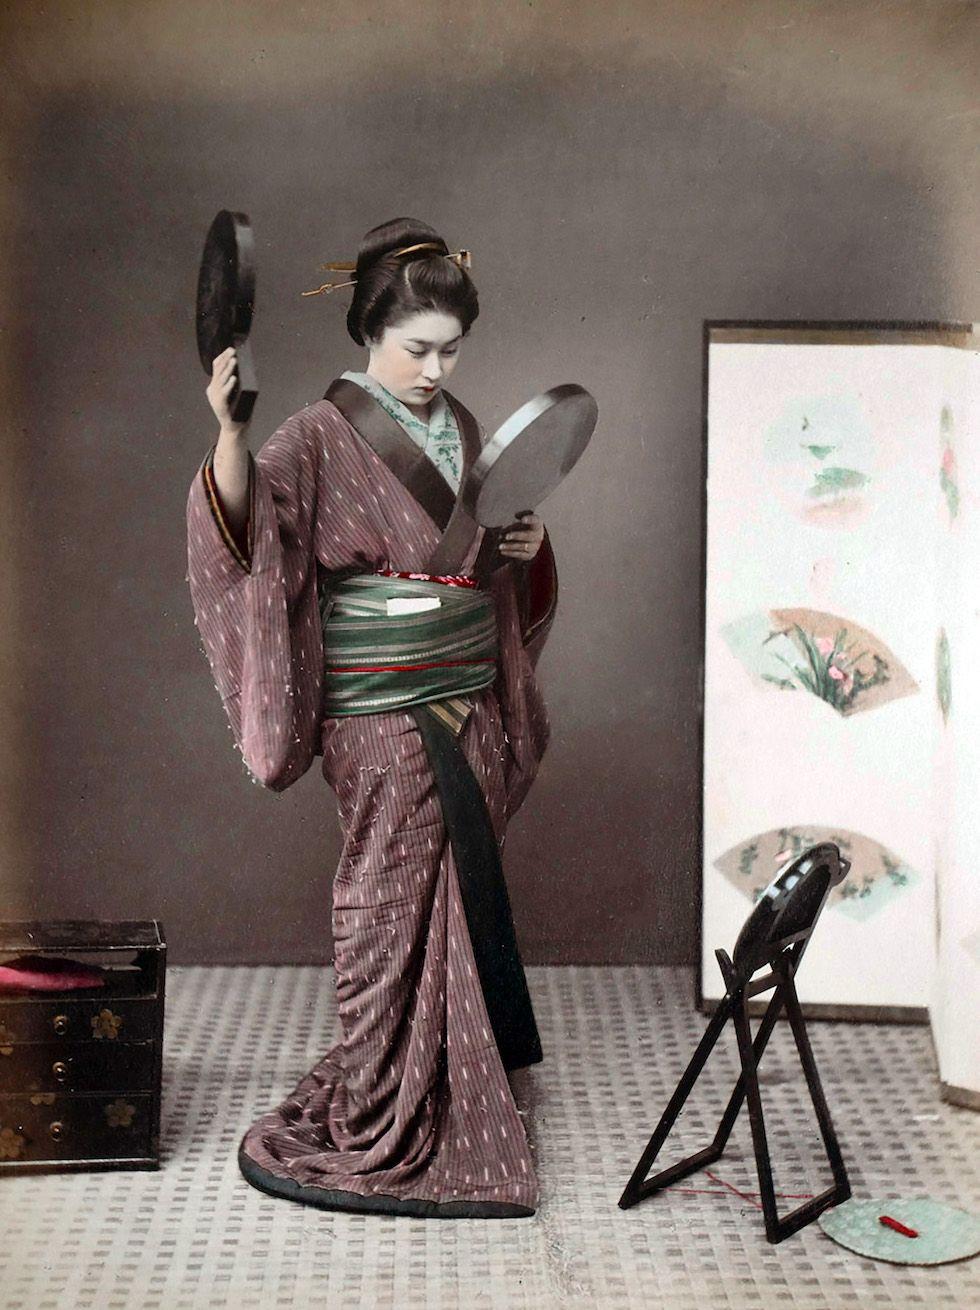 Pin di Jaana Seppälä su Geisha nel 2020 Foto vintage